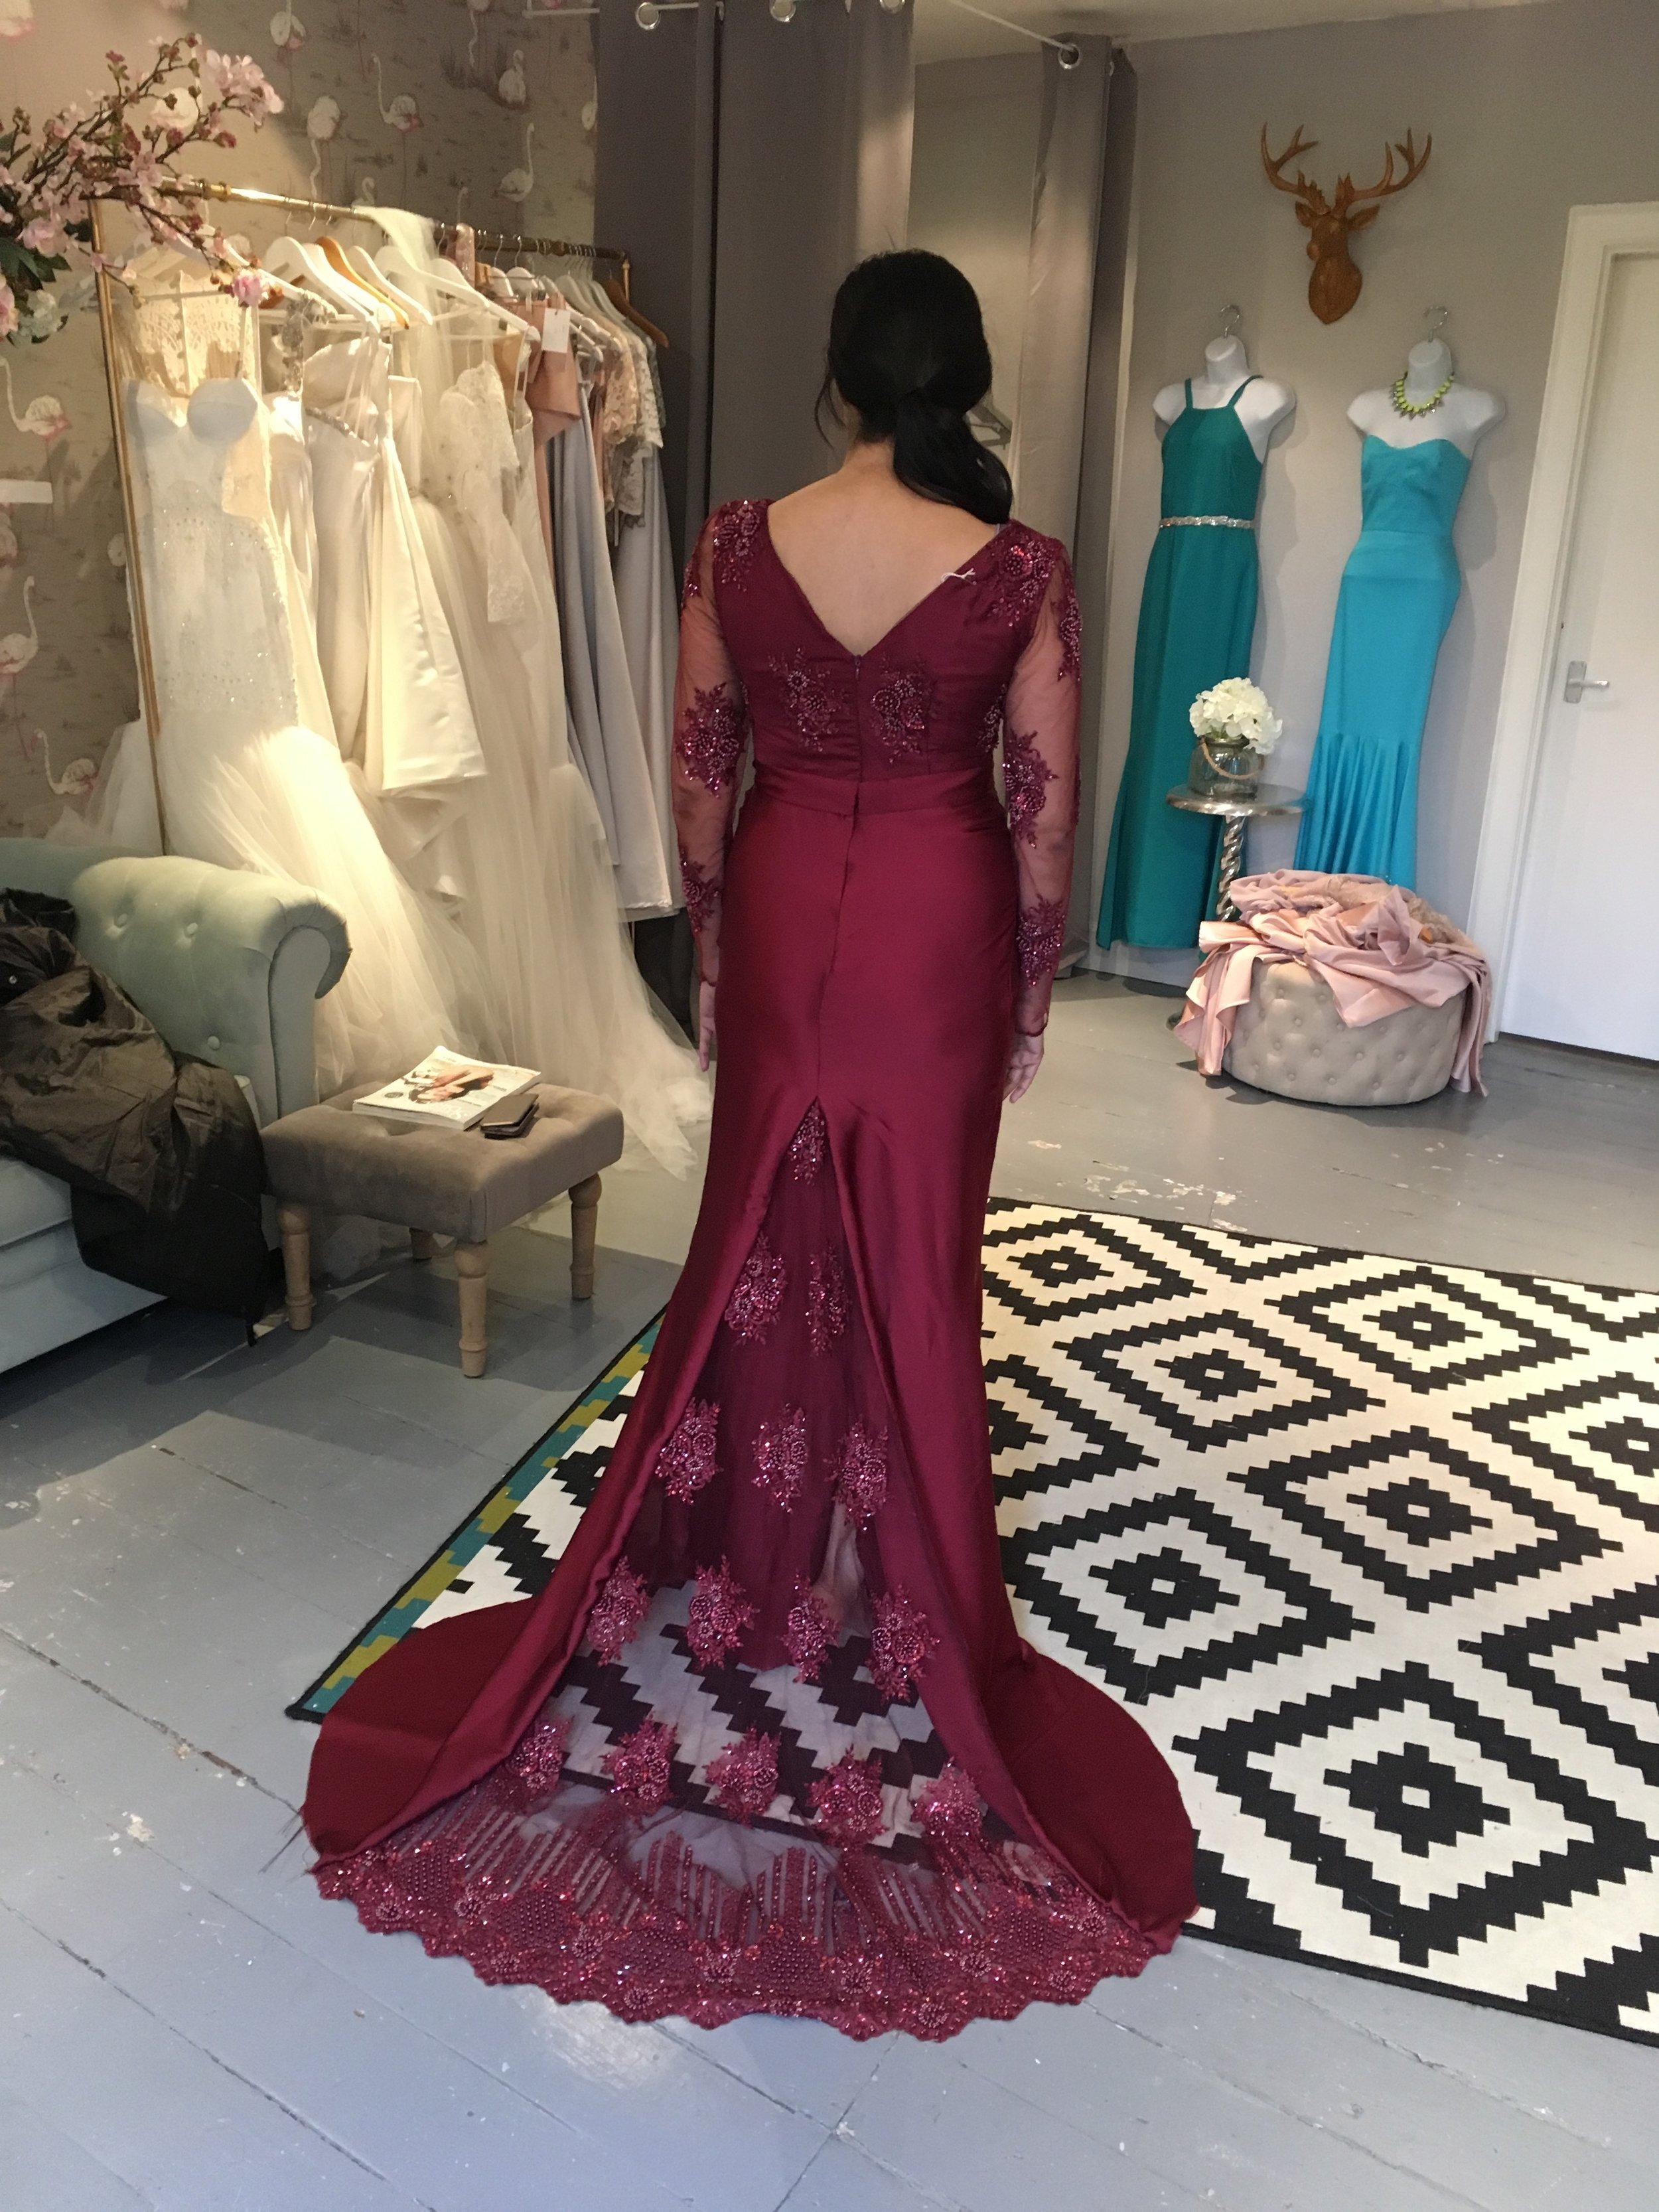 burgandy bridesmaid.JPG